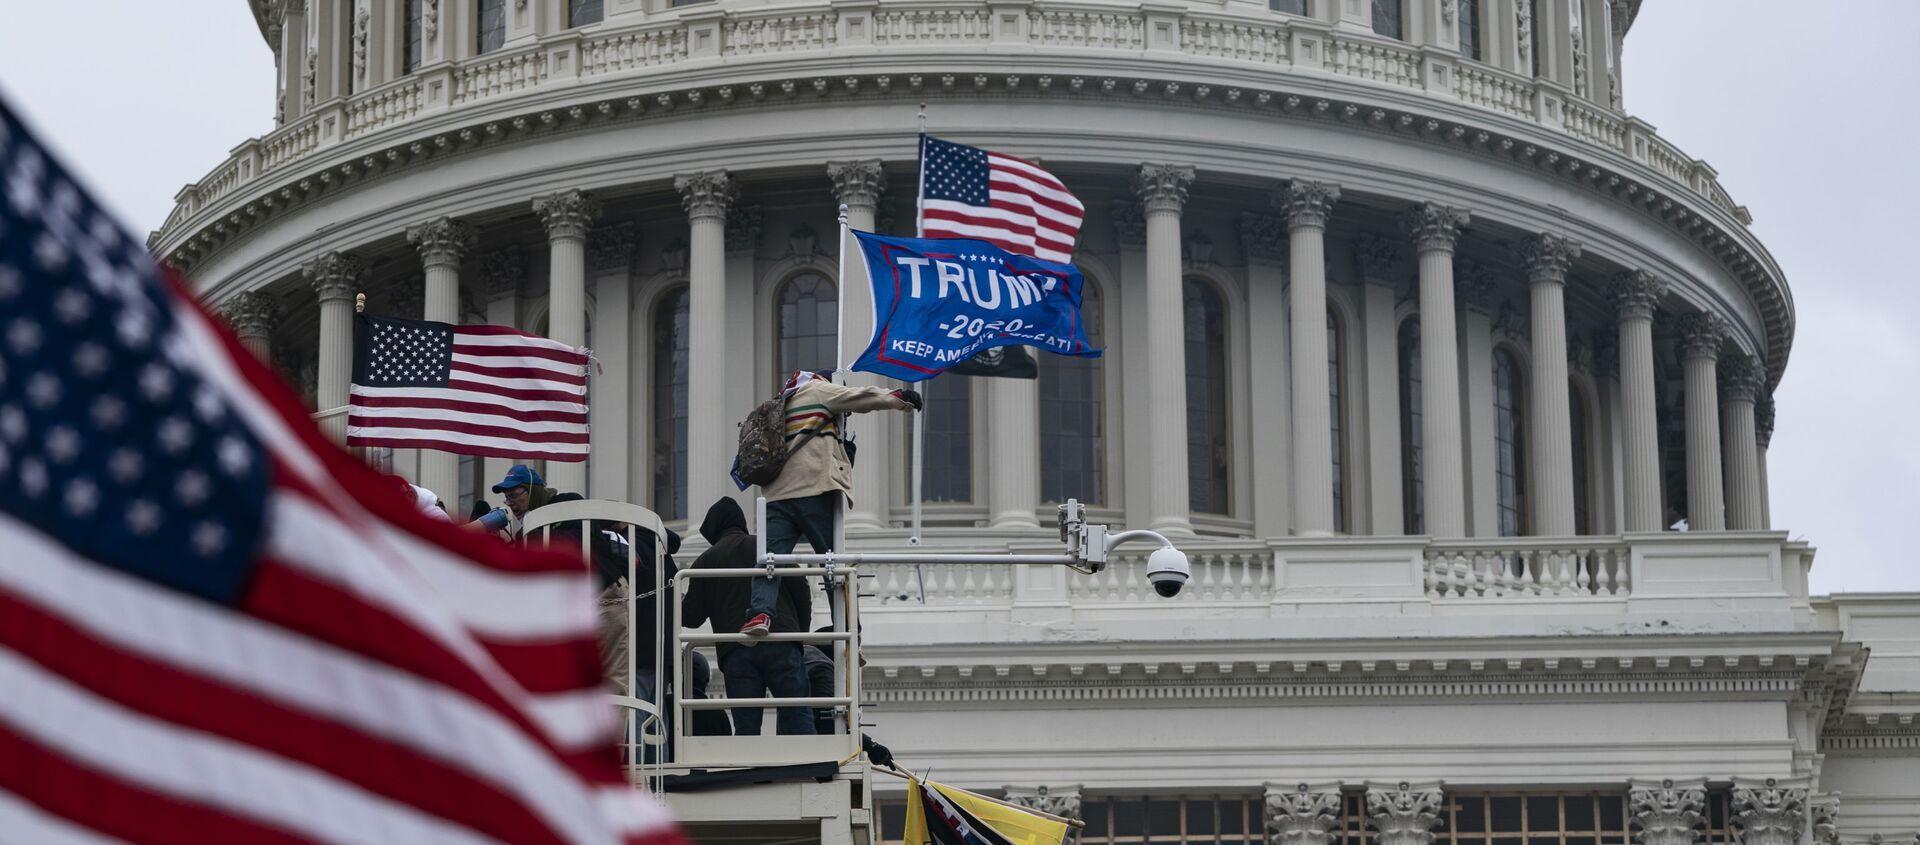 Сторонники Дональда Трампа у Капитолия - Sputnik Узбекистан, 1920, 09.01.2021